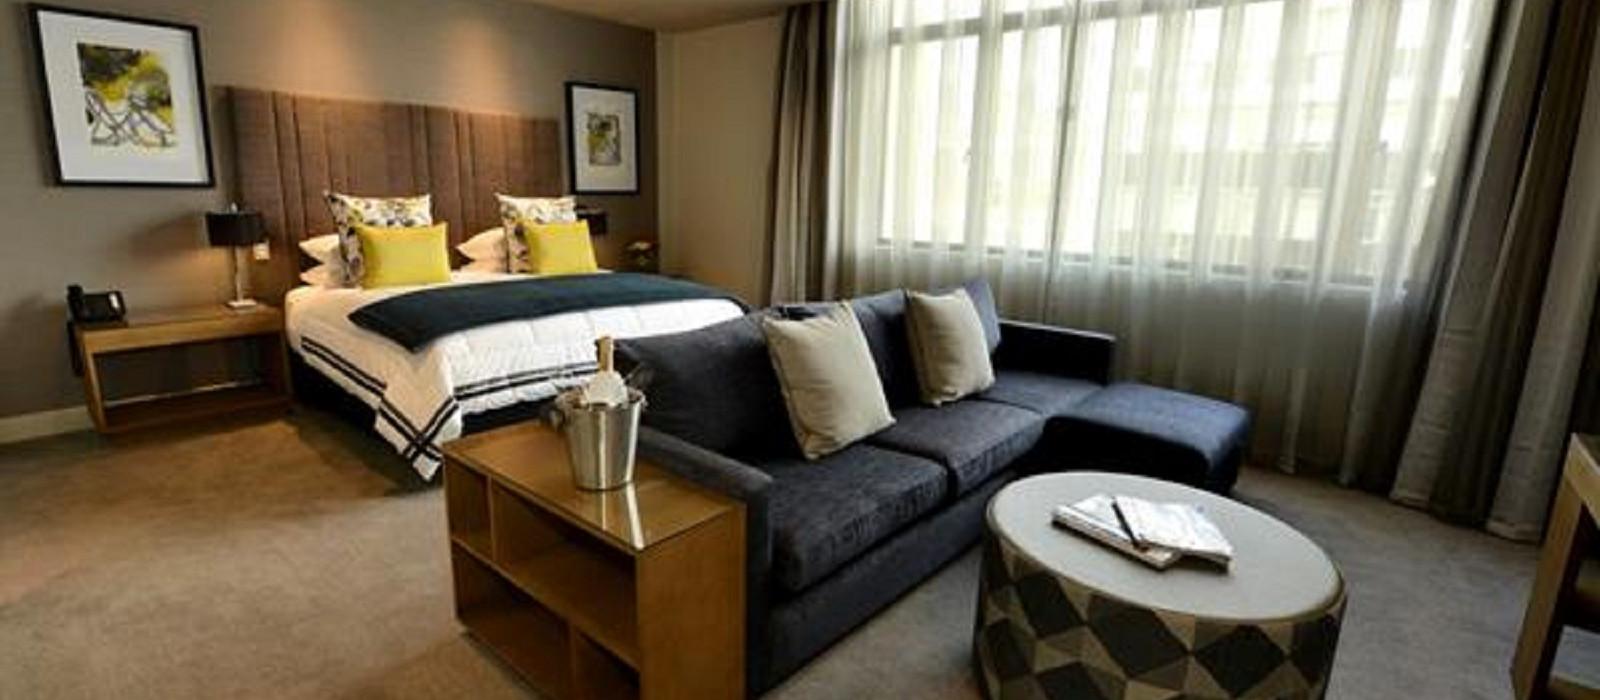 Hotel Distinction Dunedin Neuseeland